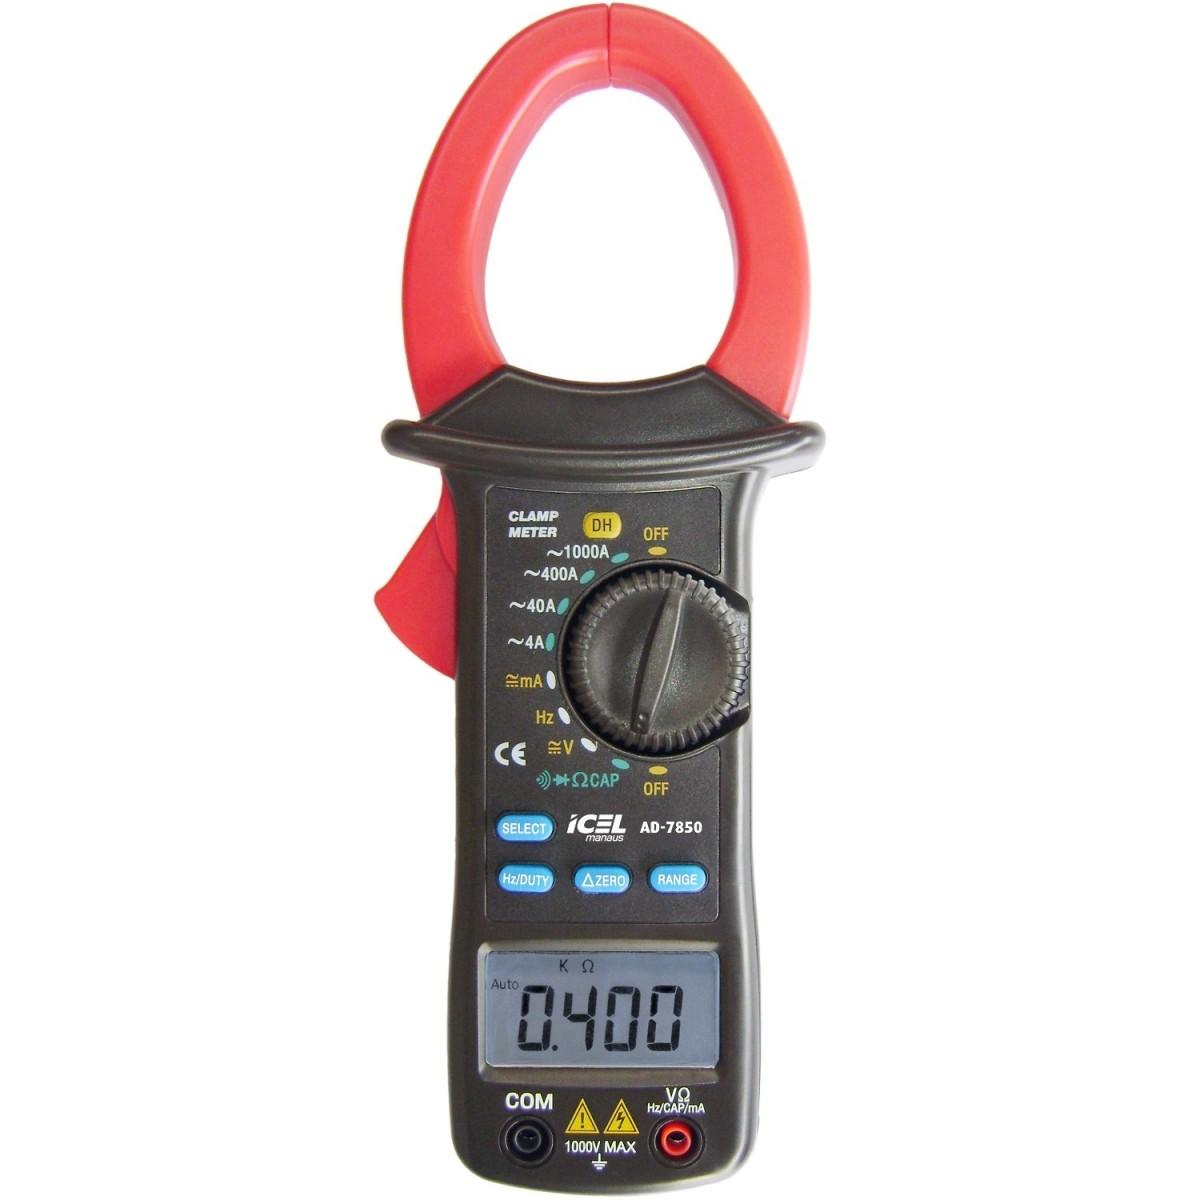 AD7850 - Alicate Digital Icel AC: 1.000A Tensão DC 1.000 AC: 700V